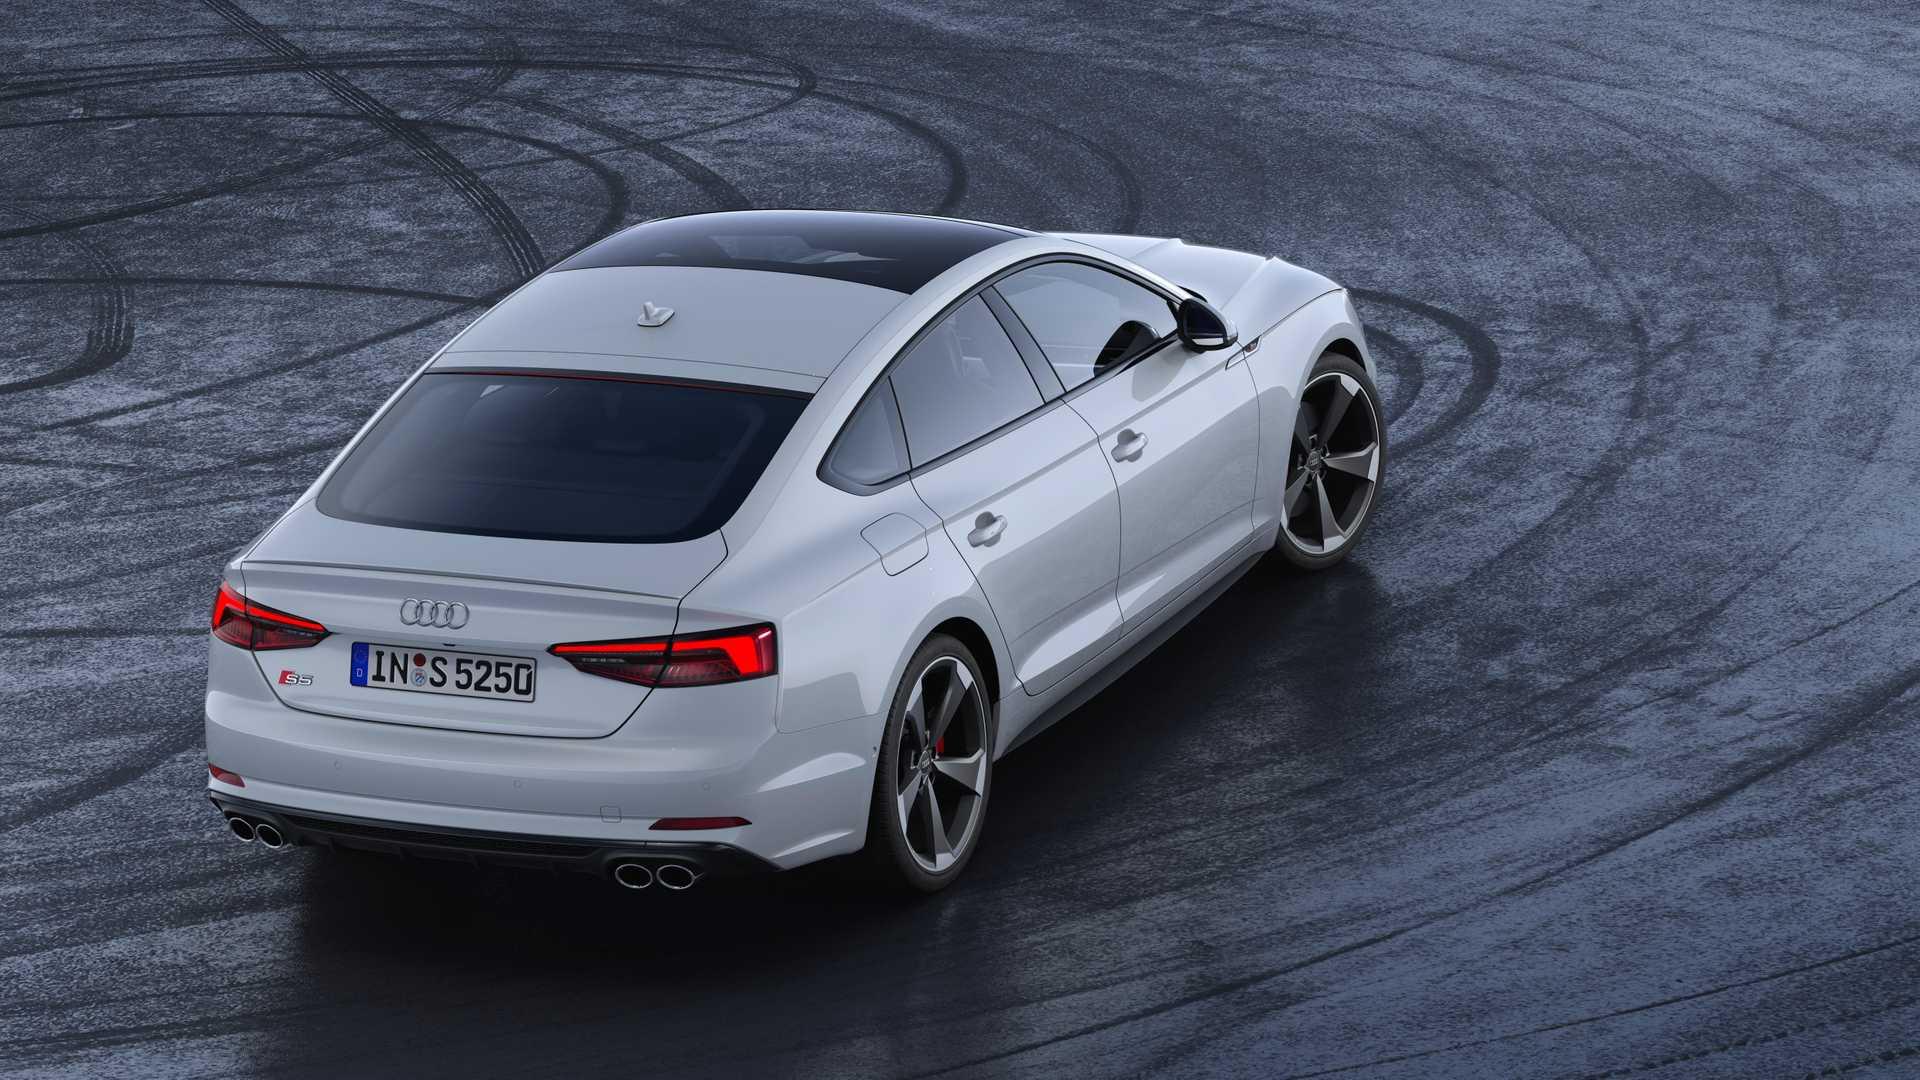 2019 Audi S5 Sportback TDI Rear Wallpaper (13)